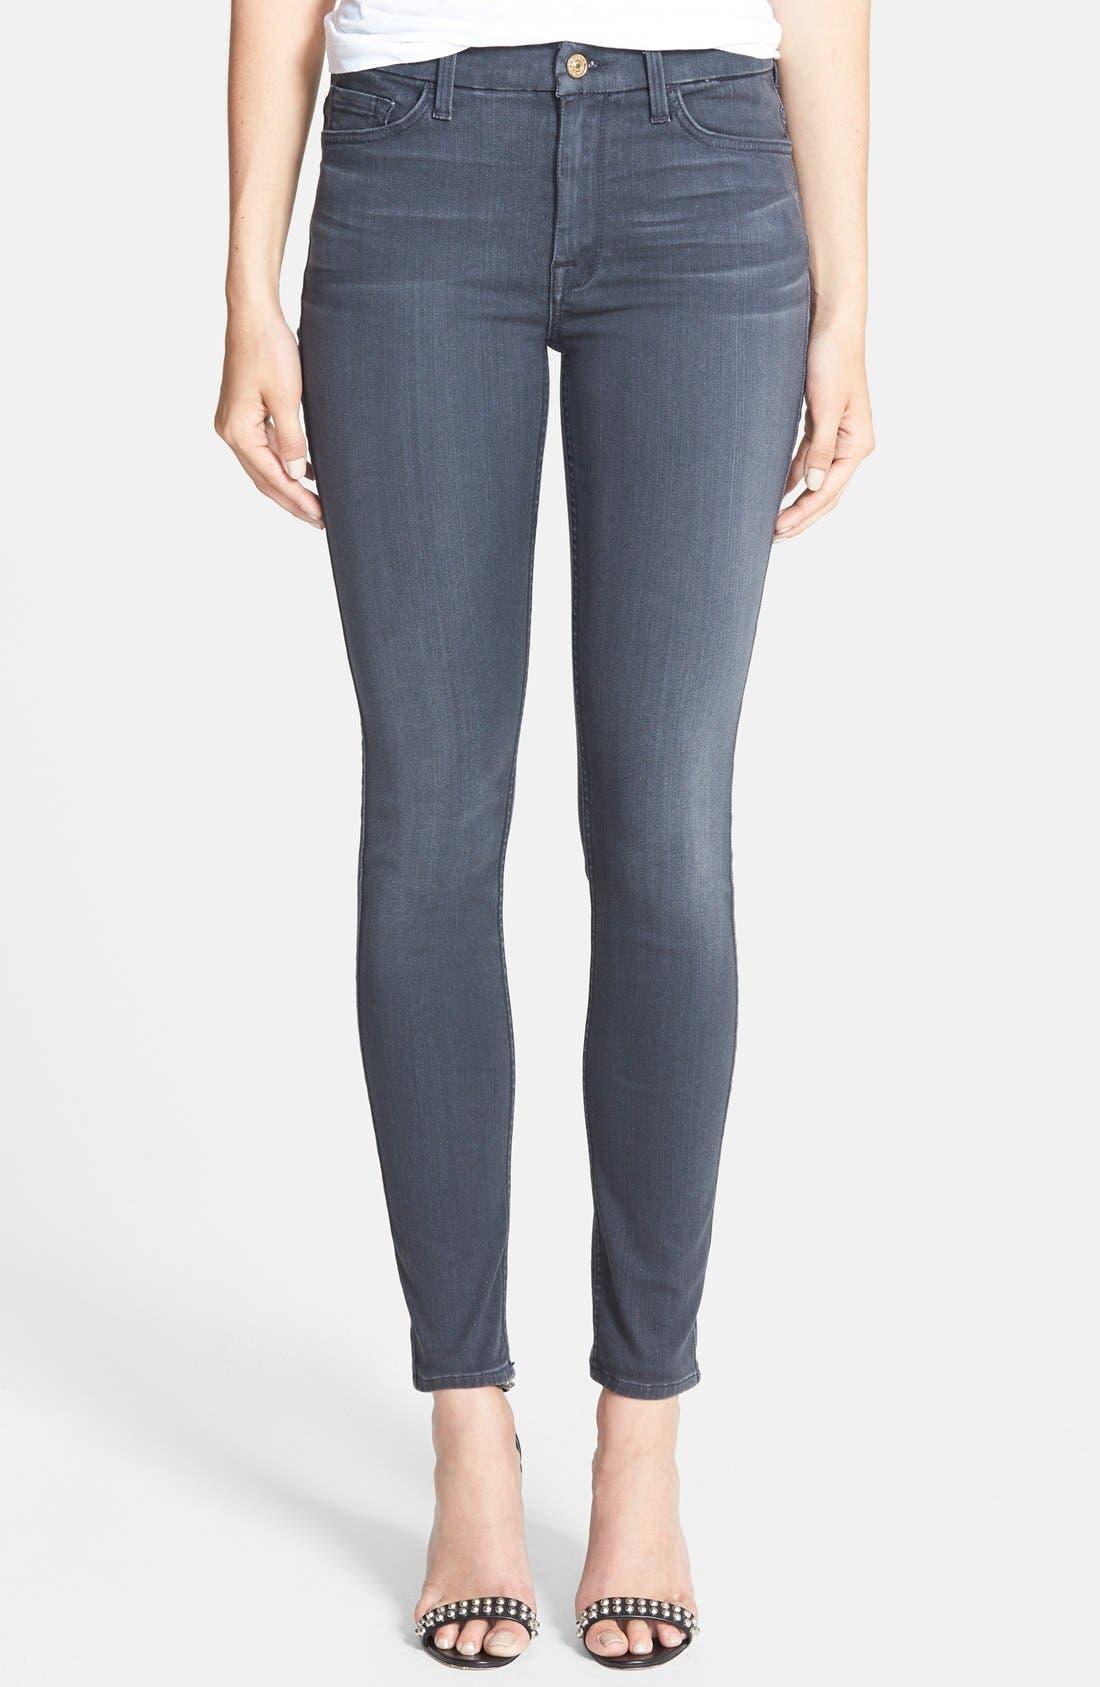 Alternate Image 1 Selected - 7 For All Mankind® High Waist Ankle Skinny Jeans (Bastille Grey)